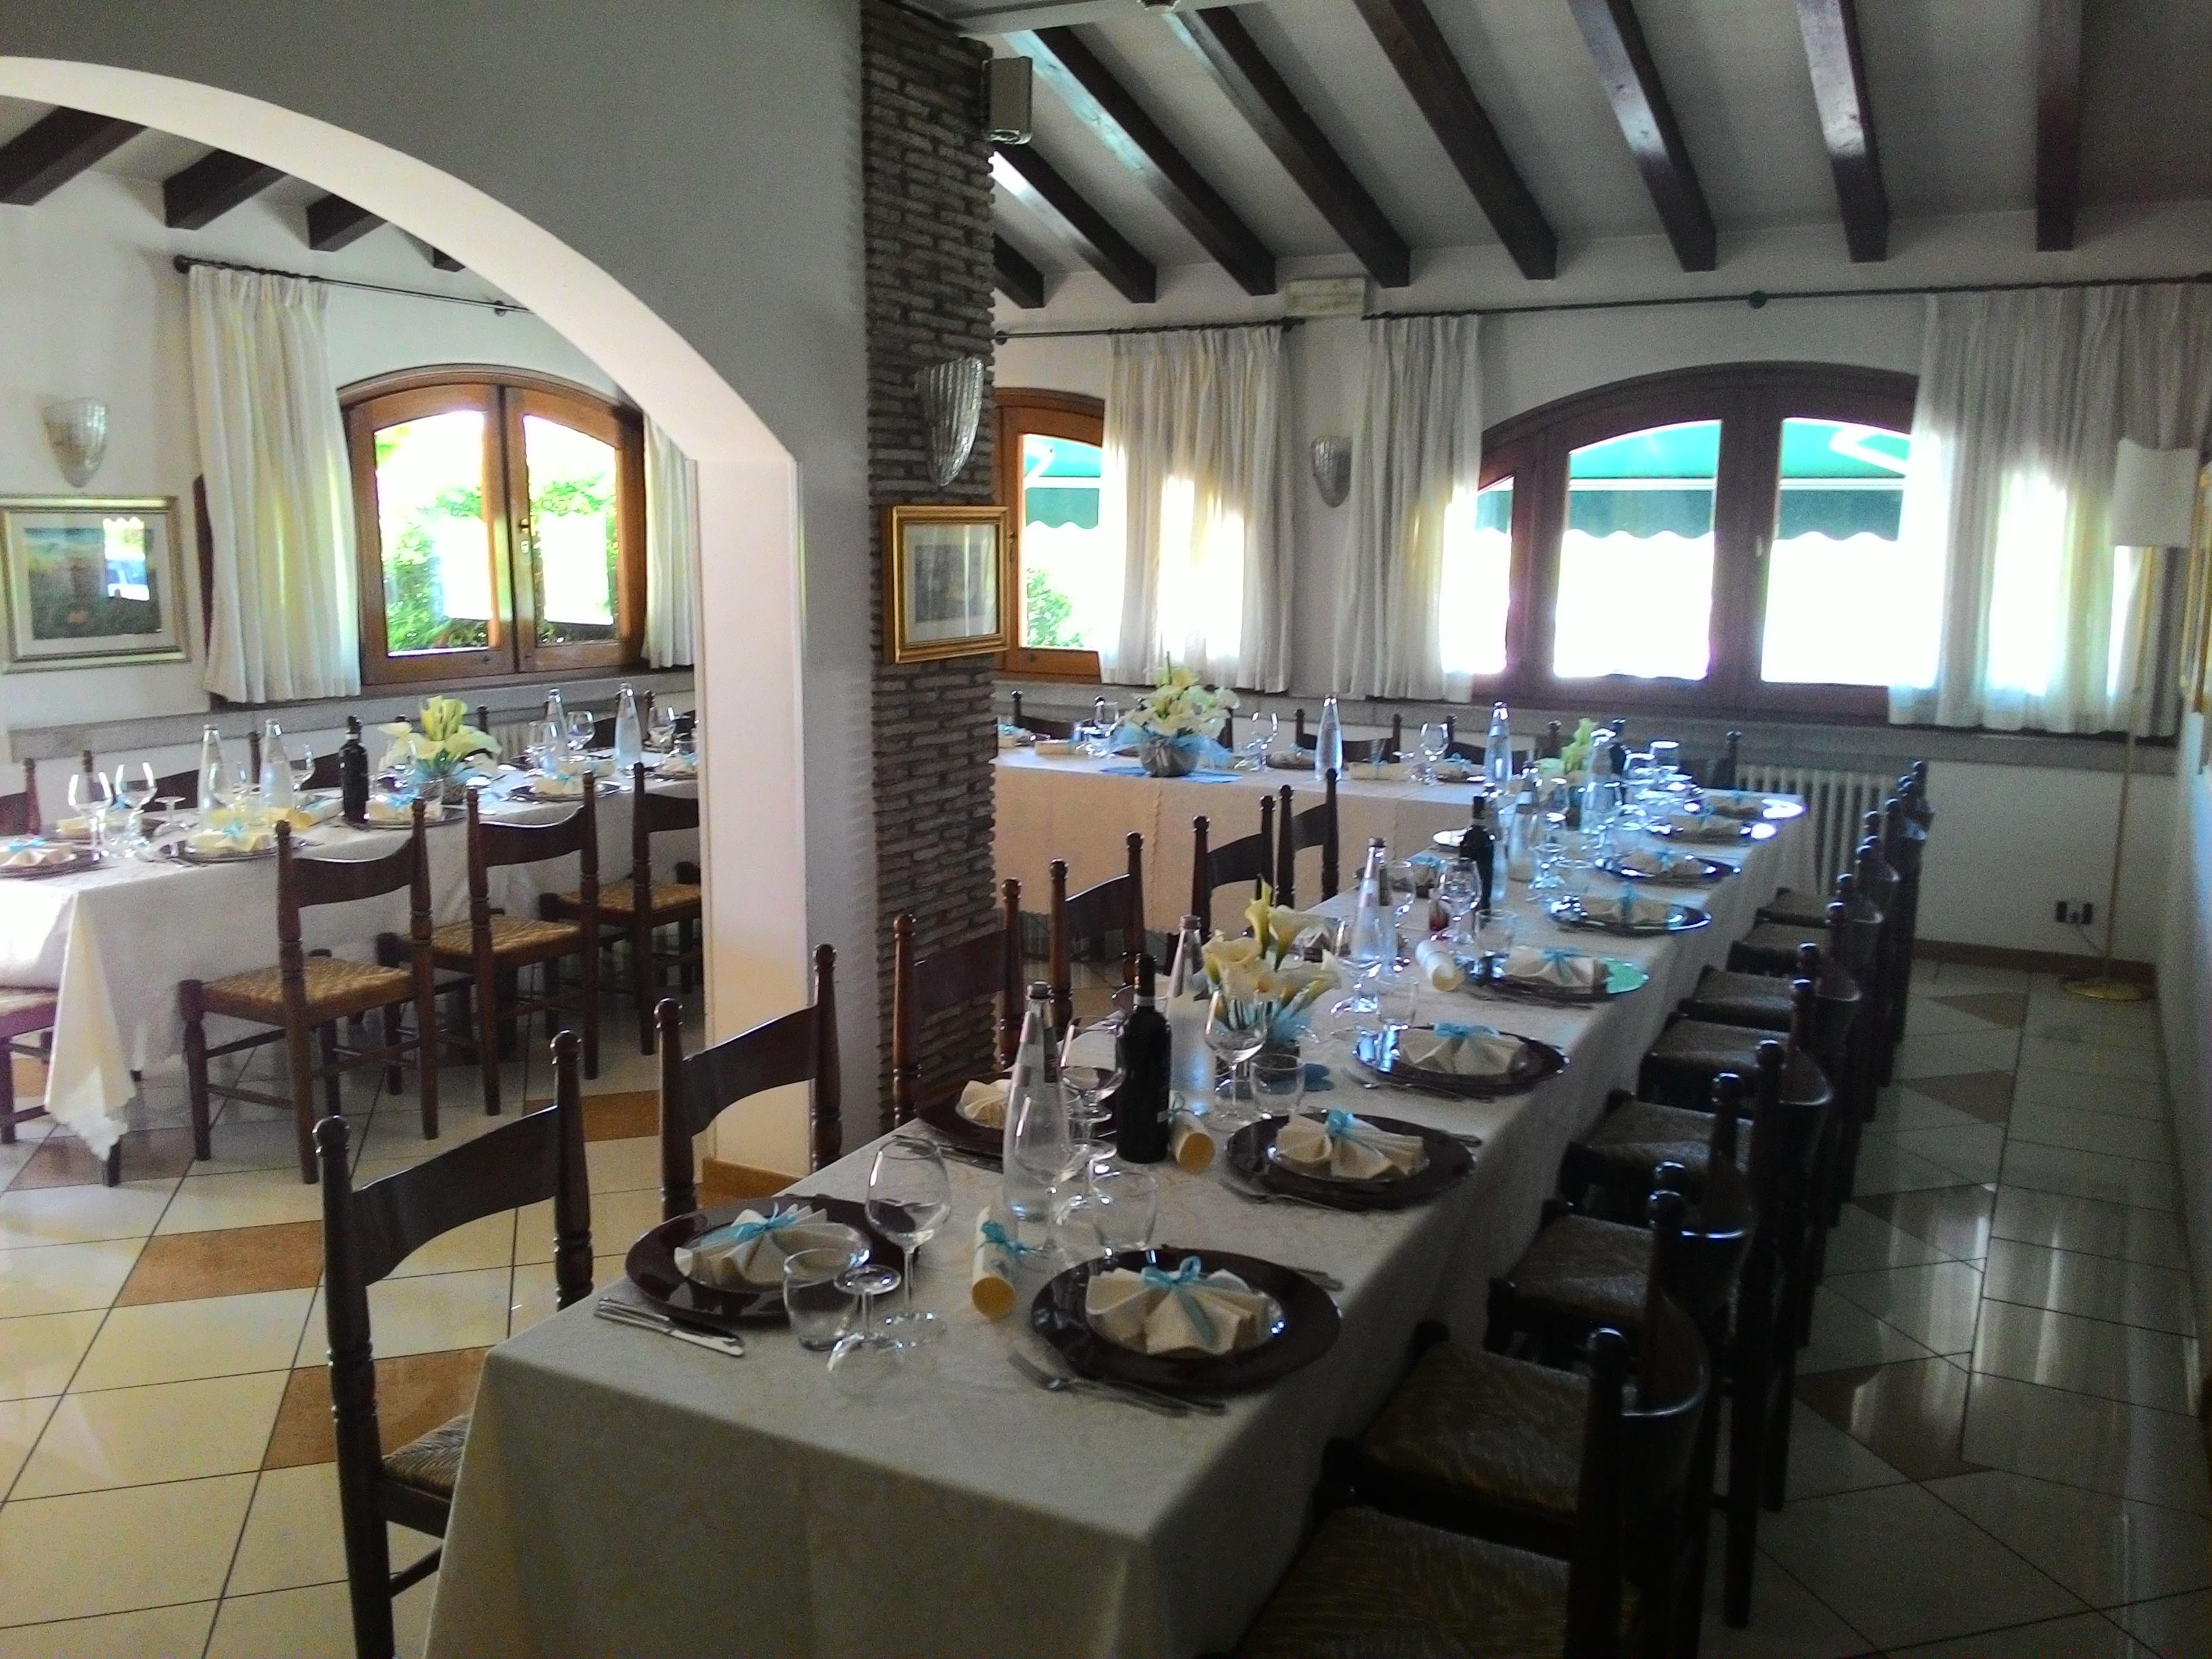 sala da pranzo alla botte